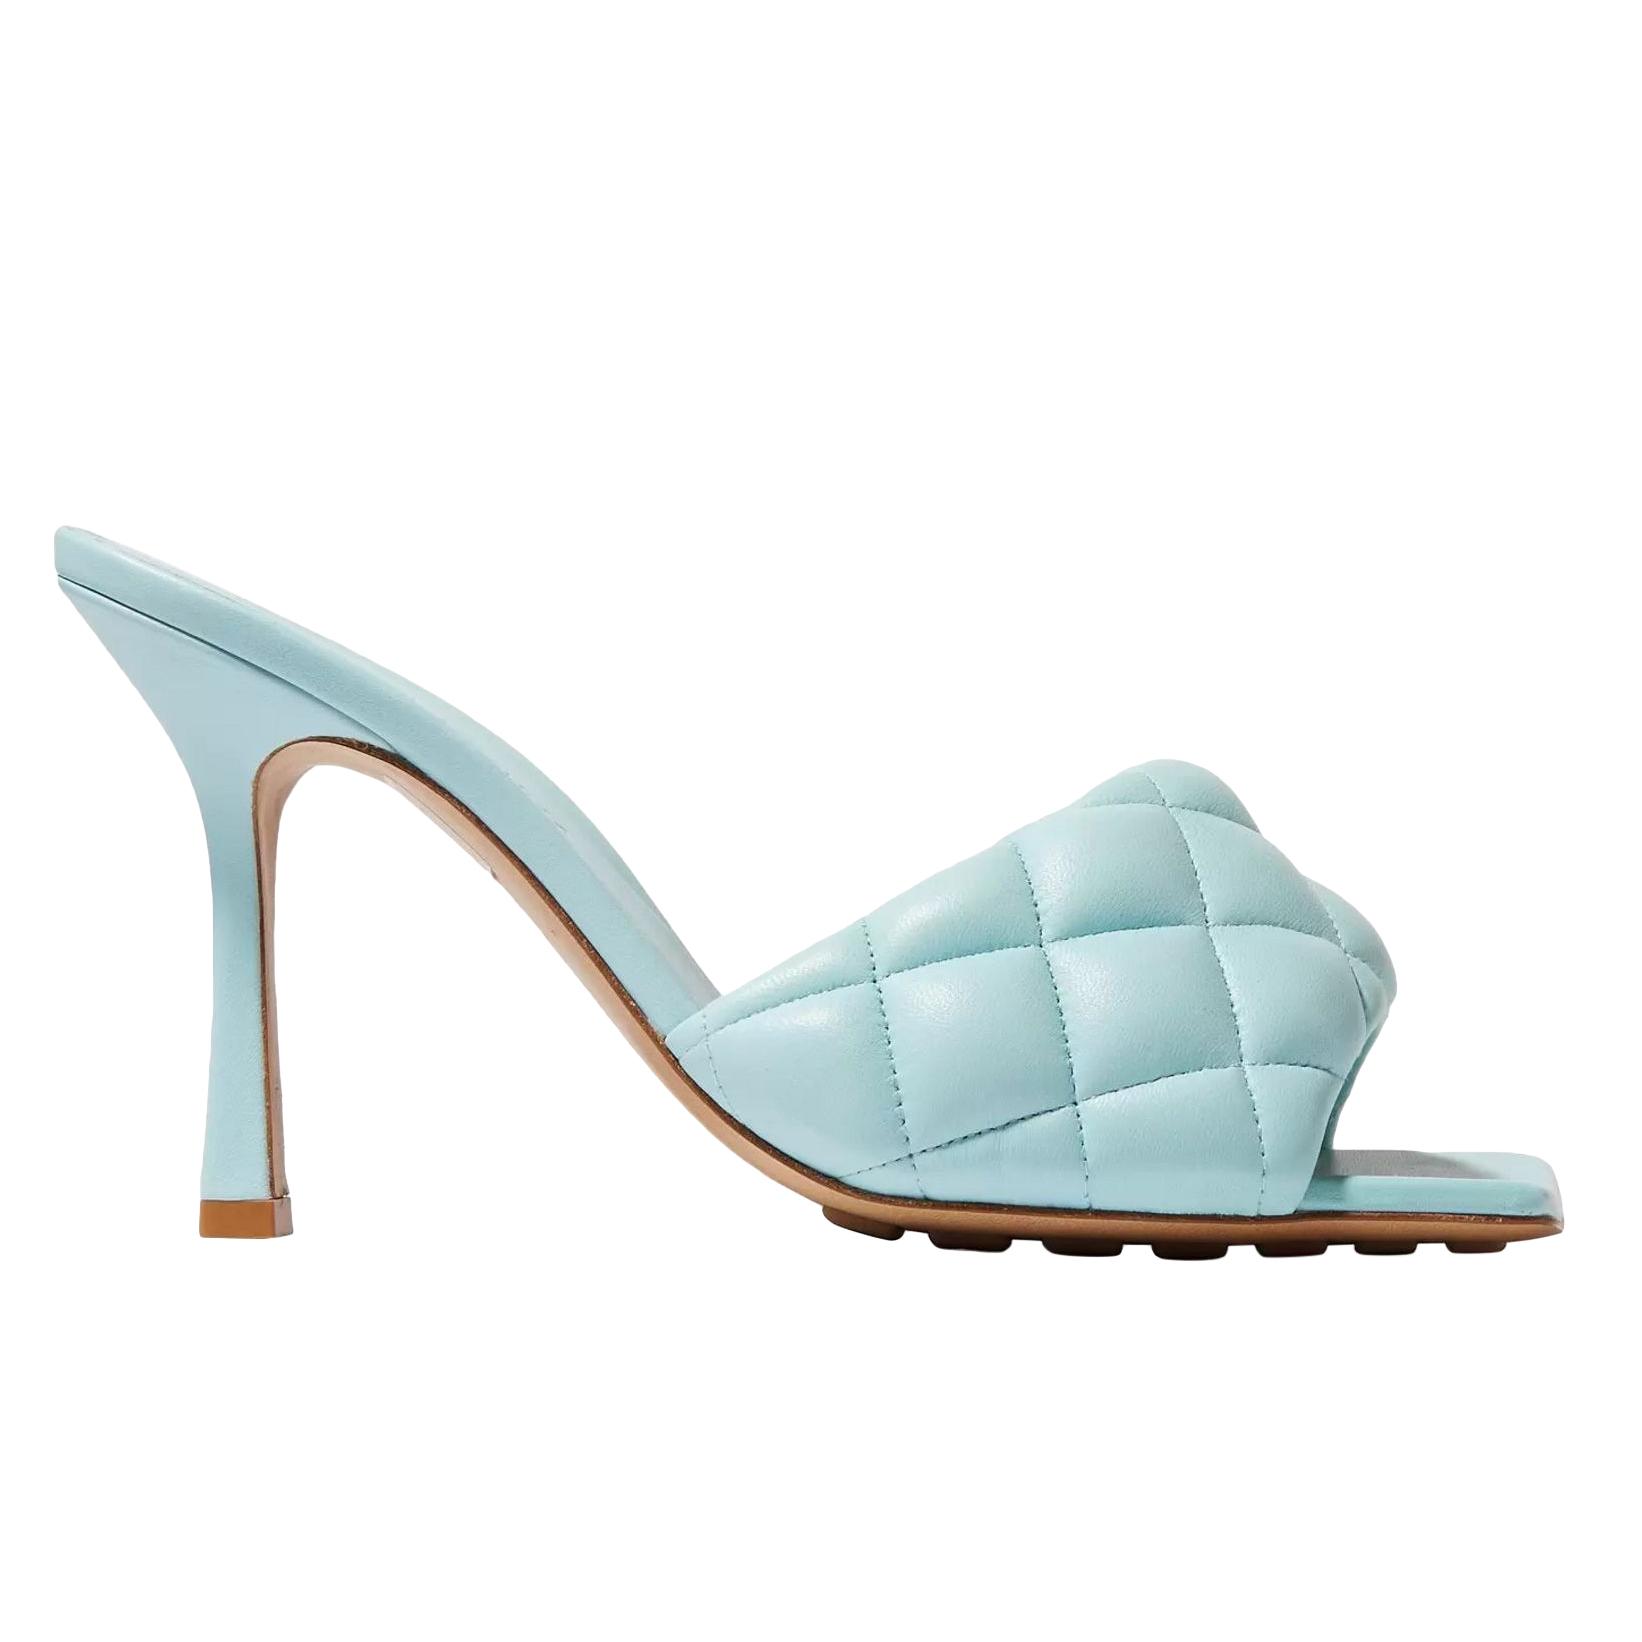 Bottega Veneta blue quilted padded nappa leather mules